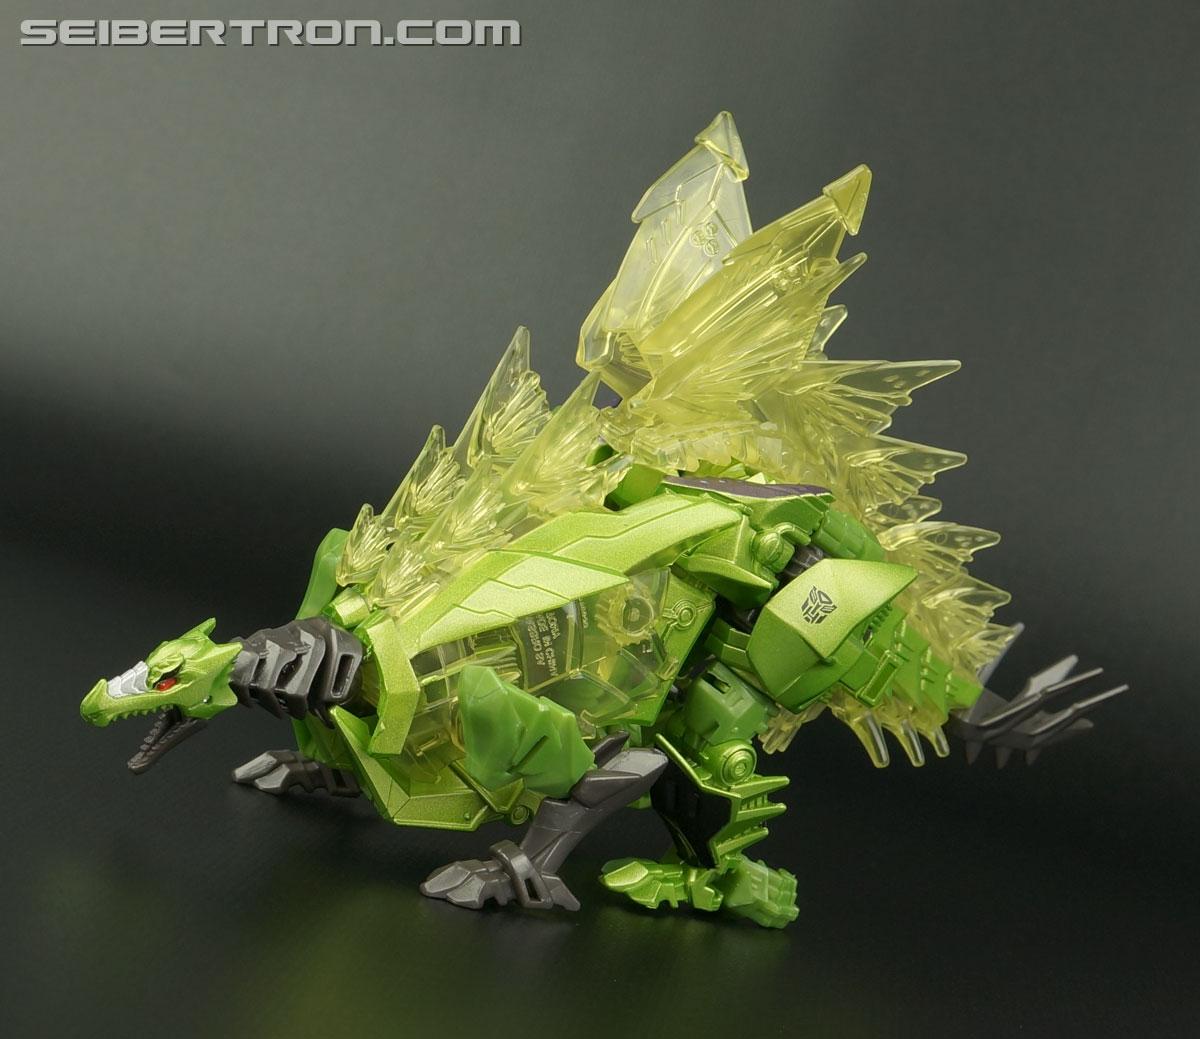 Transformers Takara Tomy: Movie Advanced Snarl (Image #46 of 154)